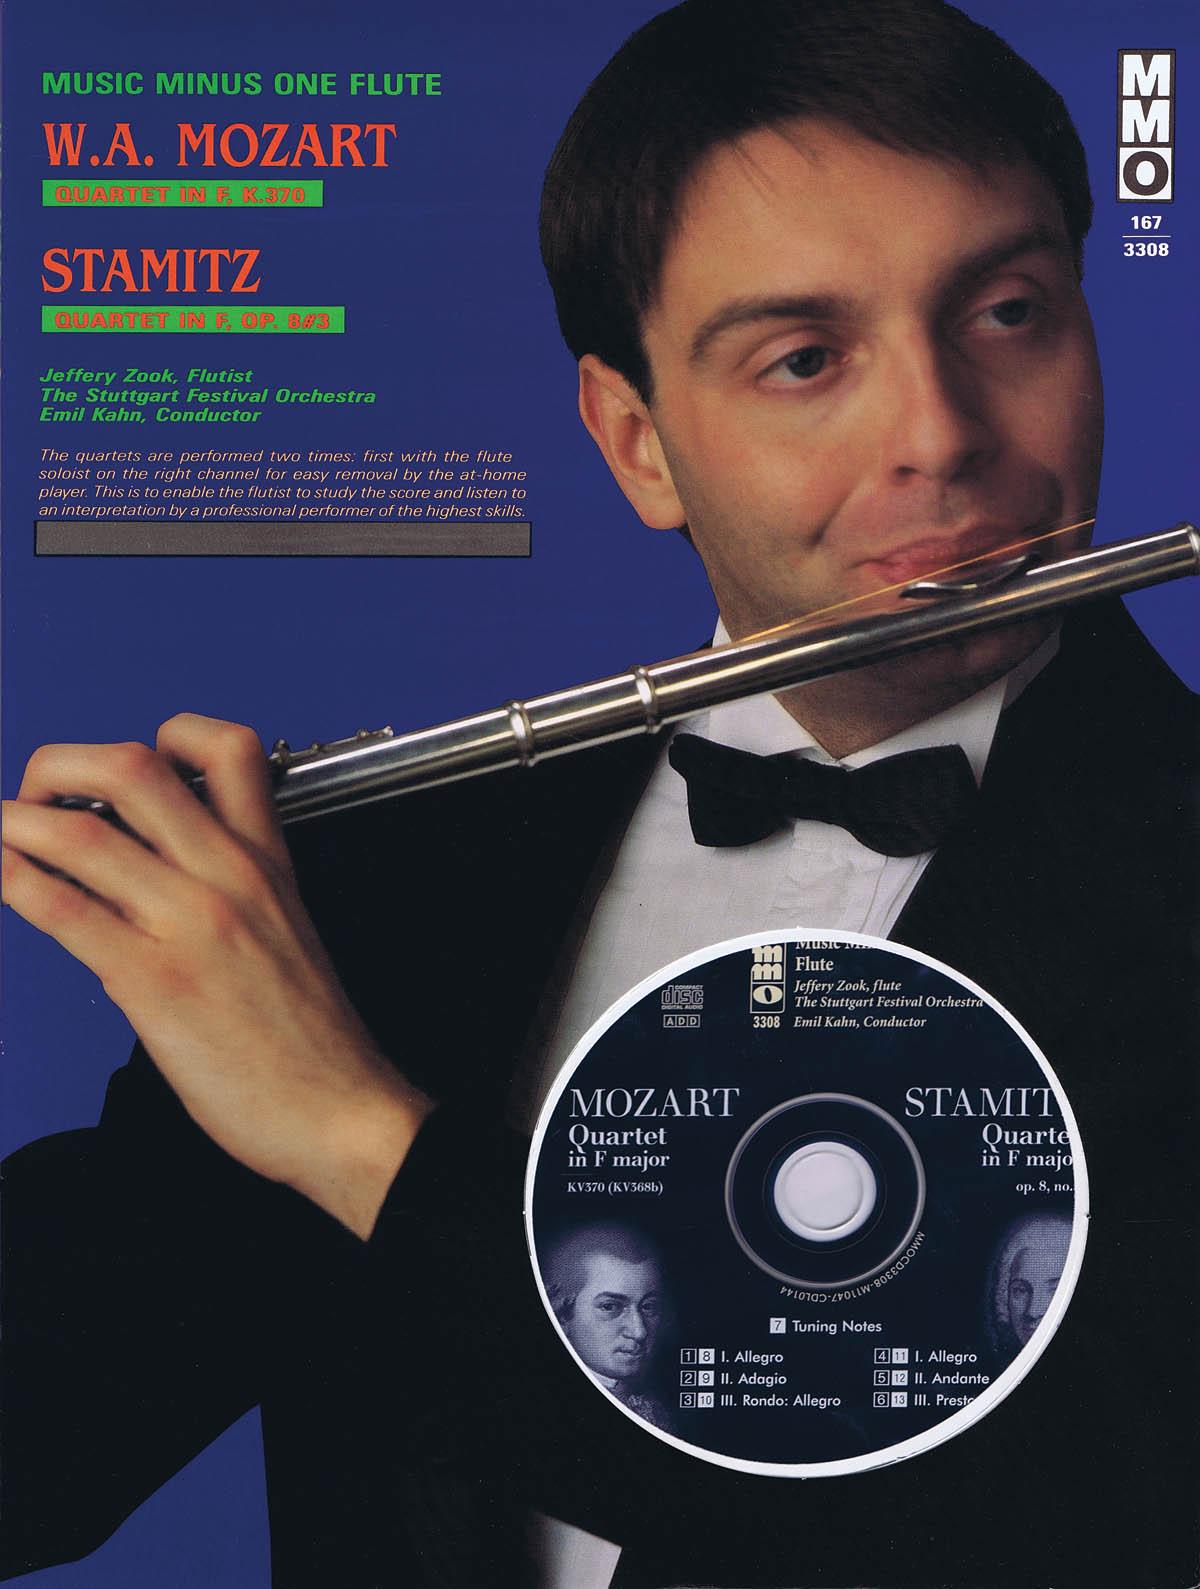 Wolfgang Amadeus Mozart Stamitz: Quartet in F Major  Kv370: Flute Solo: